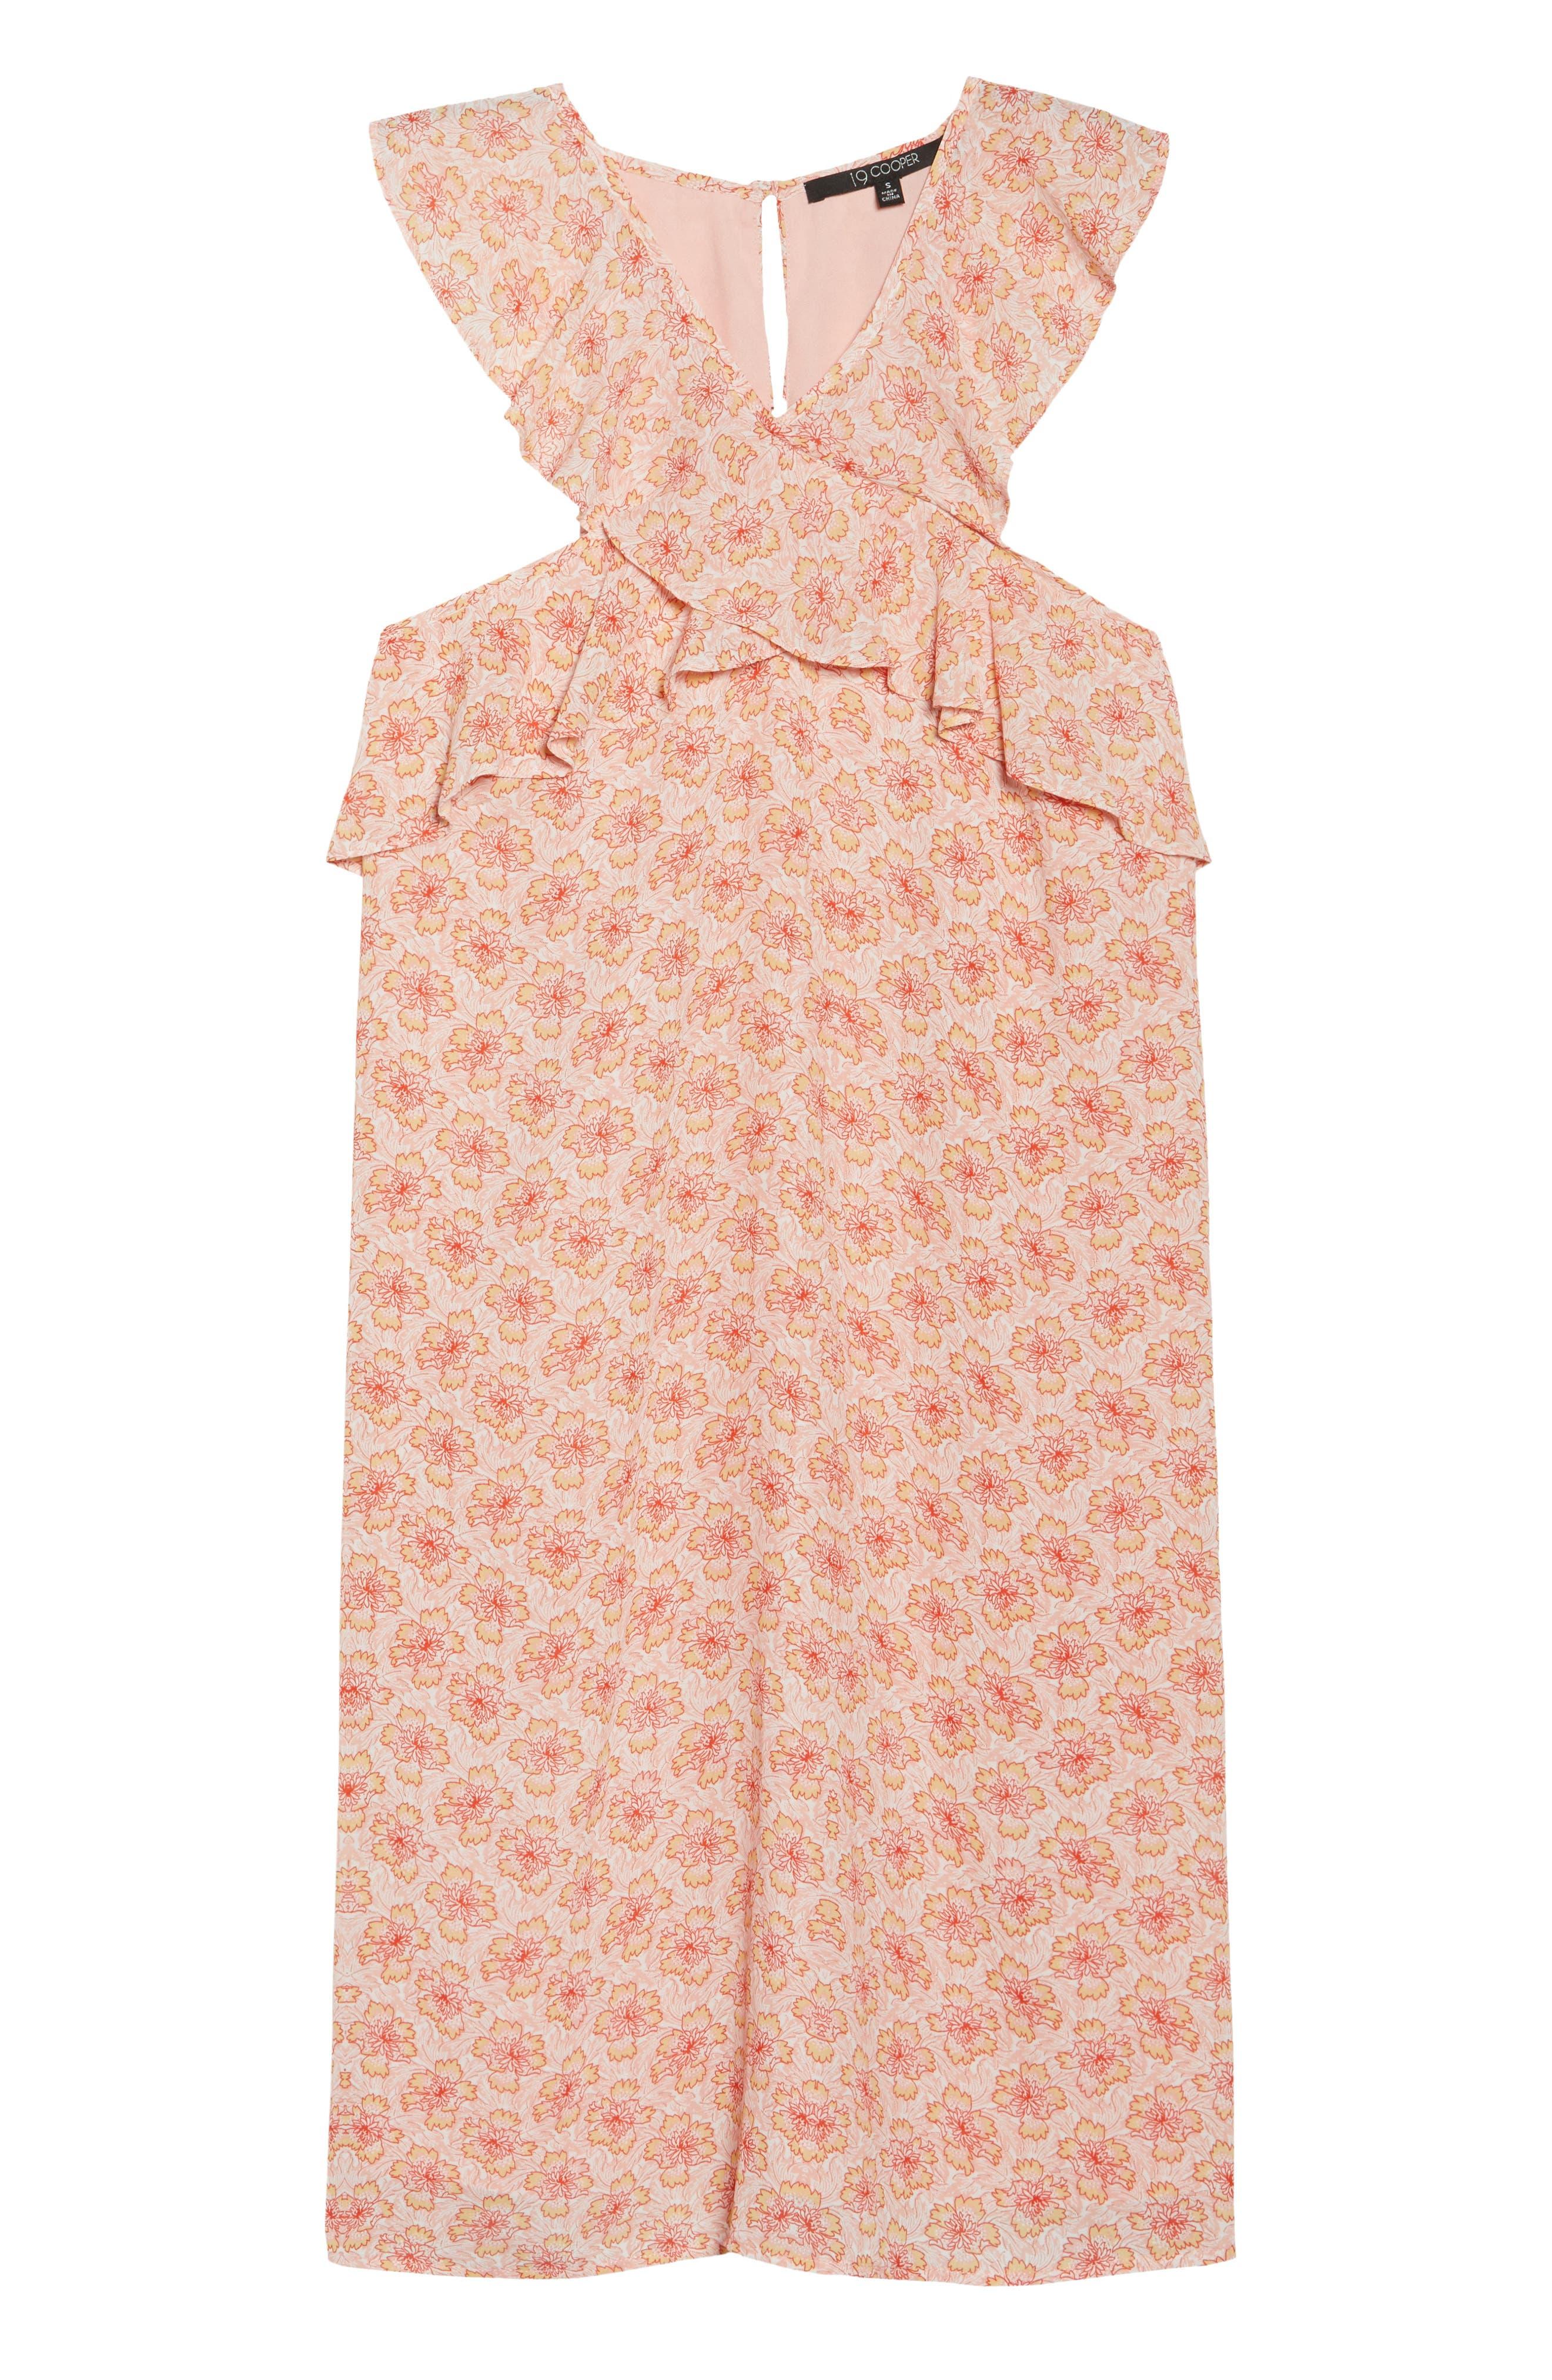 Crisscross Ruffle Shift Dress,                             Alternate thumbnail 7, color,                             Pink Multi